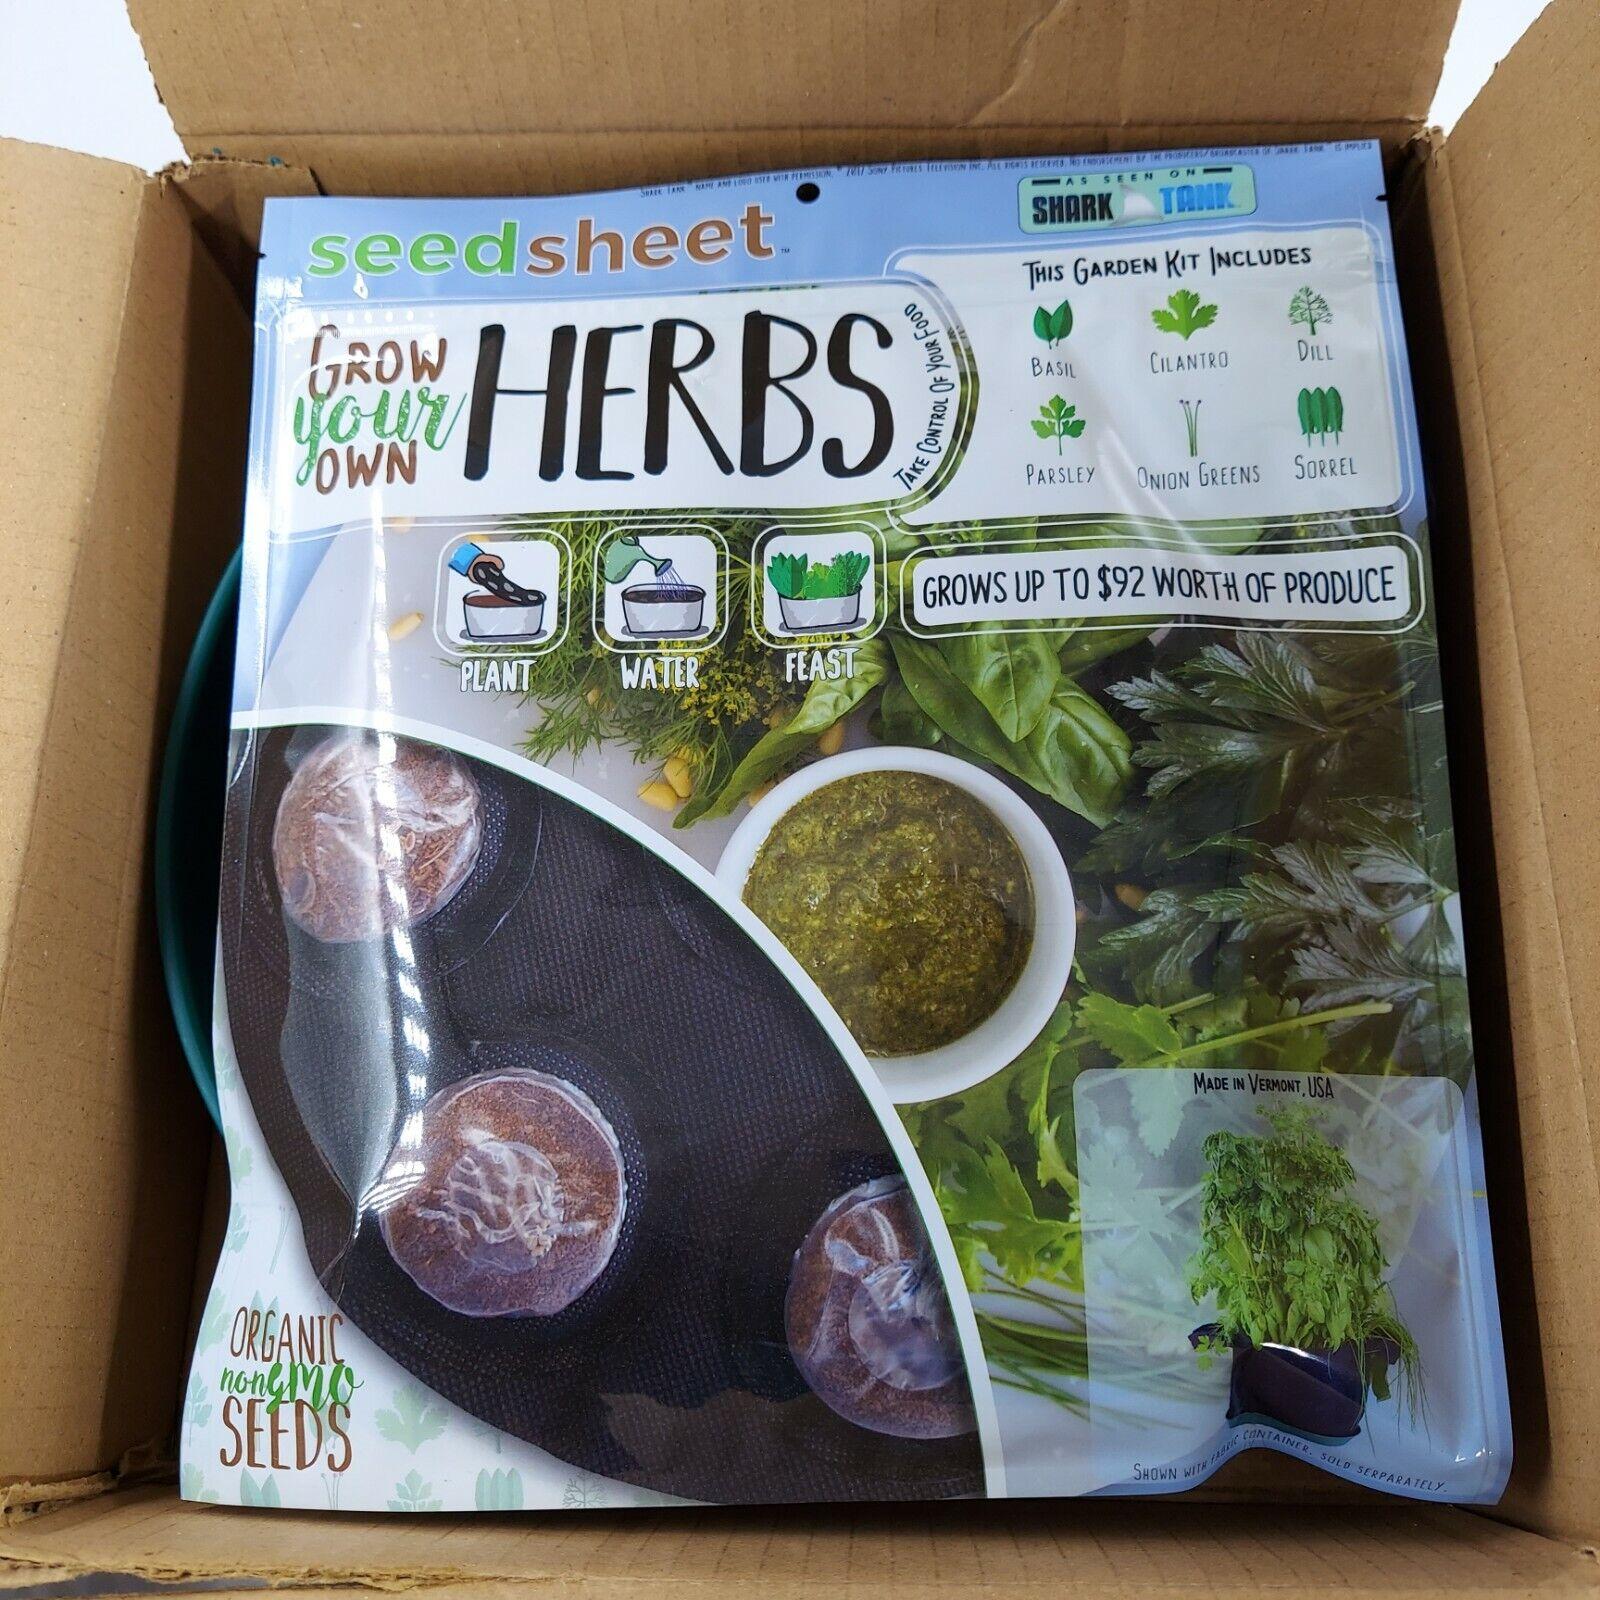 Grow Your Own Herbs Partial Kit Fast Growing Organic NonGMO Recipe Garden kit